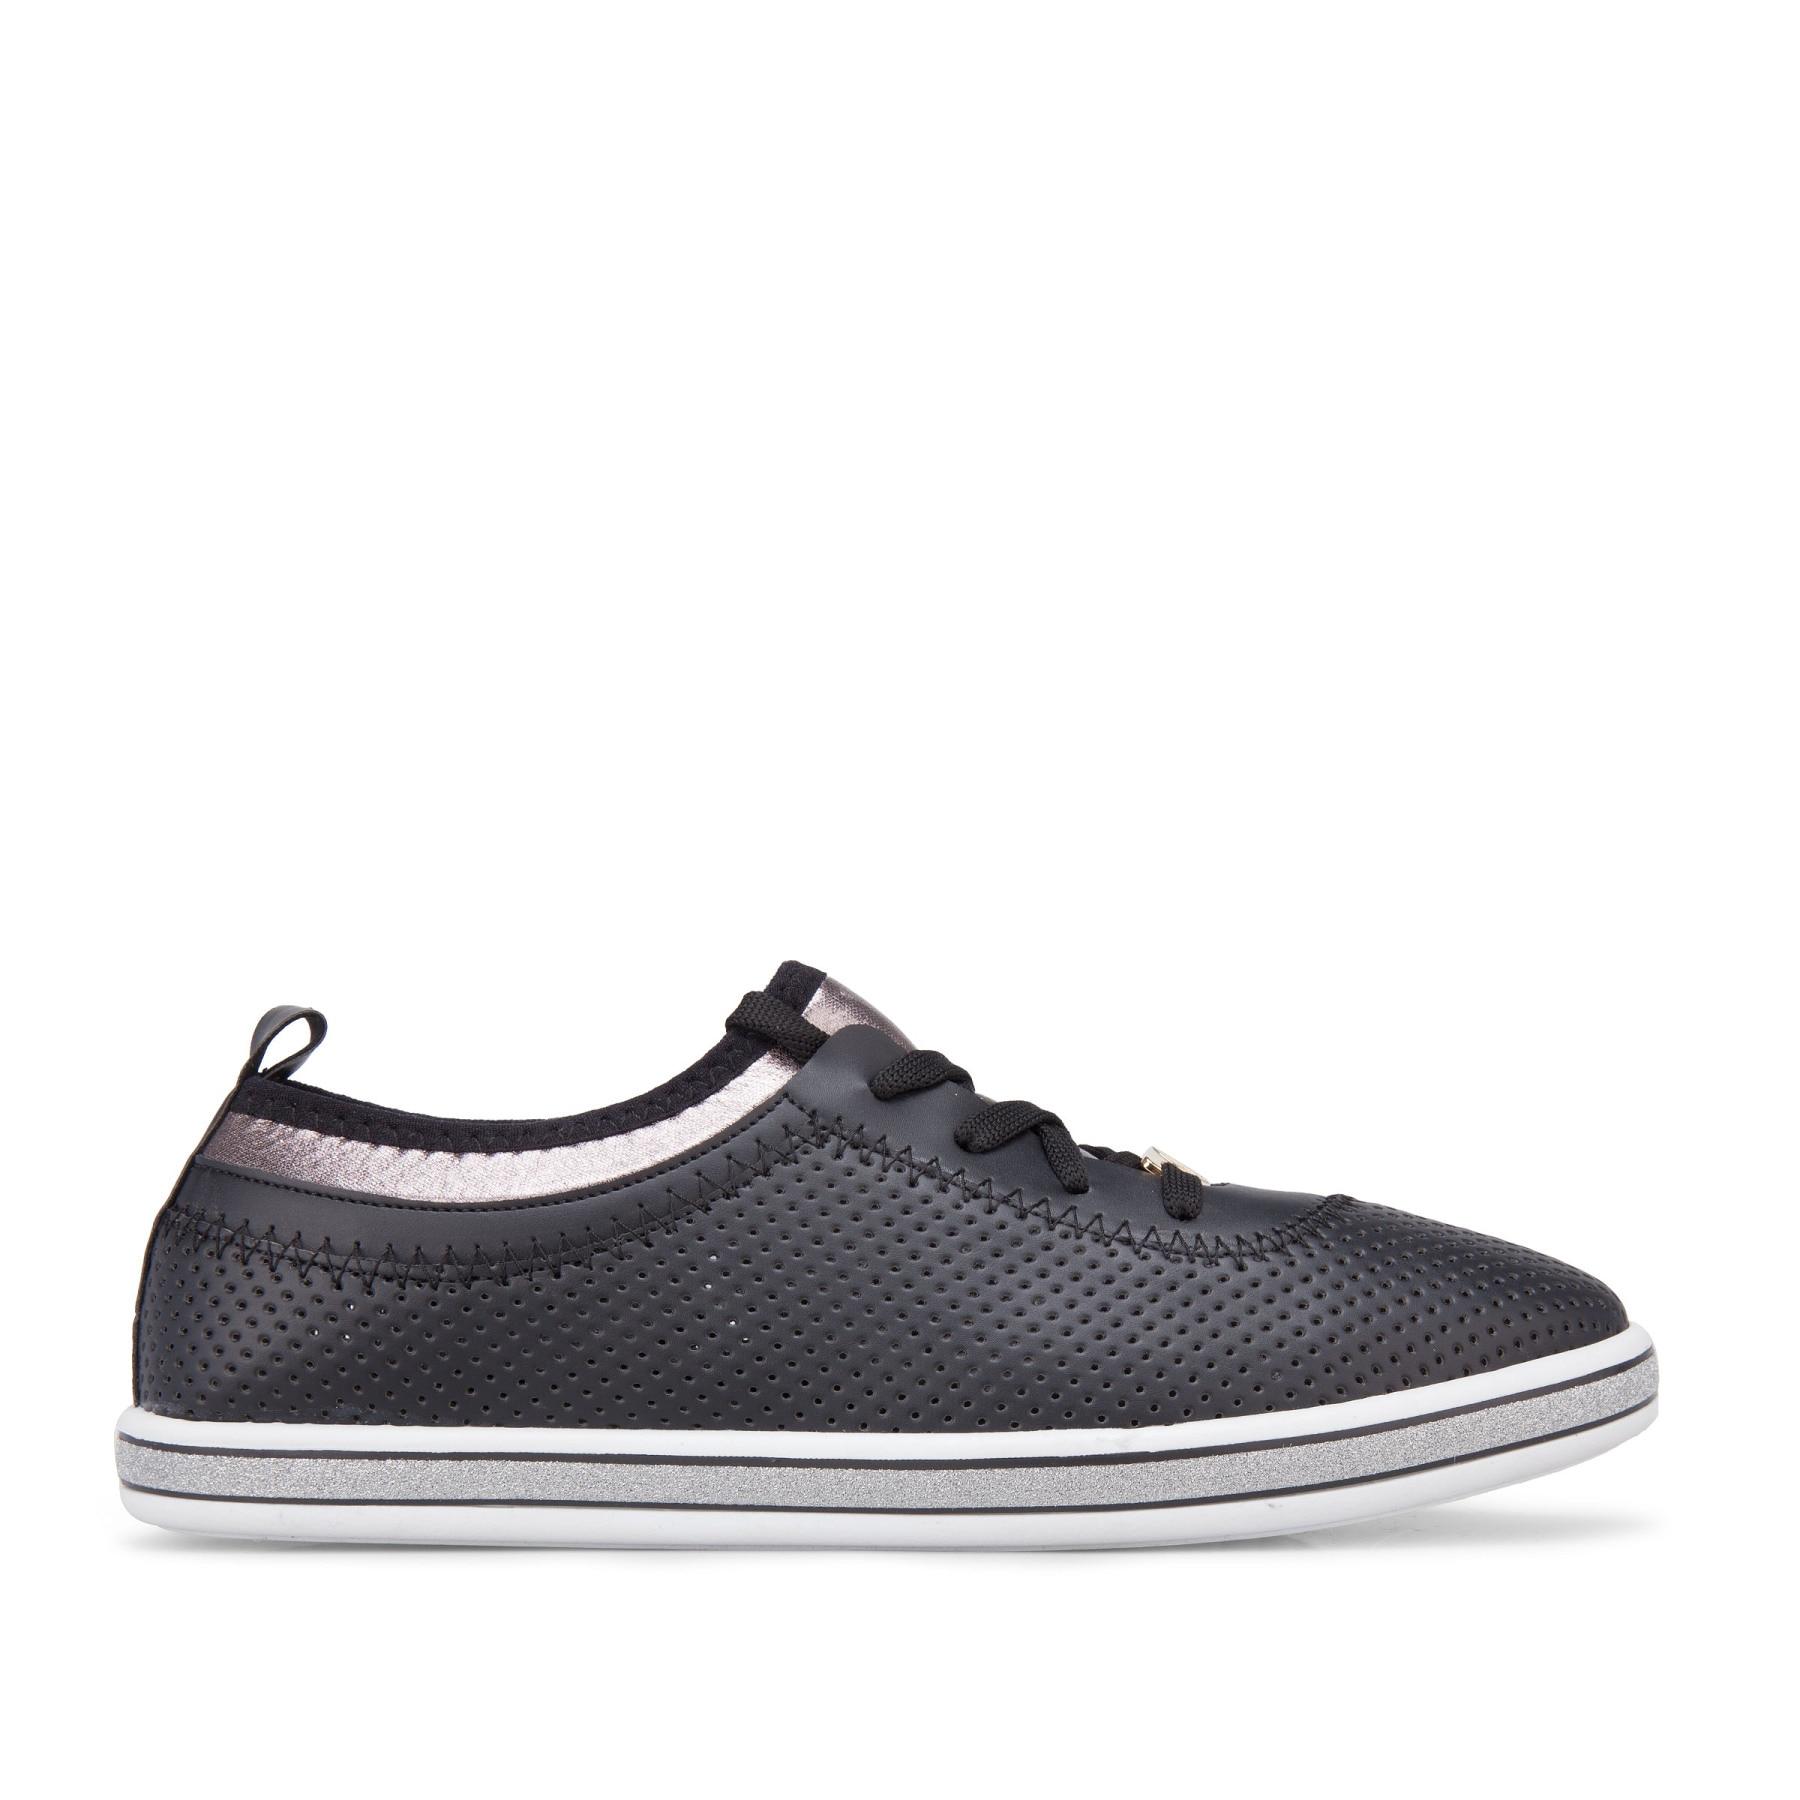 Pierre Cardin Shoes WOMEN SHOES 53080